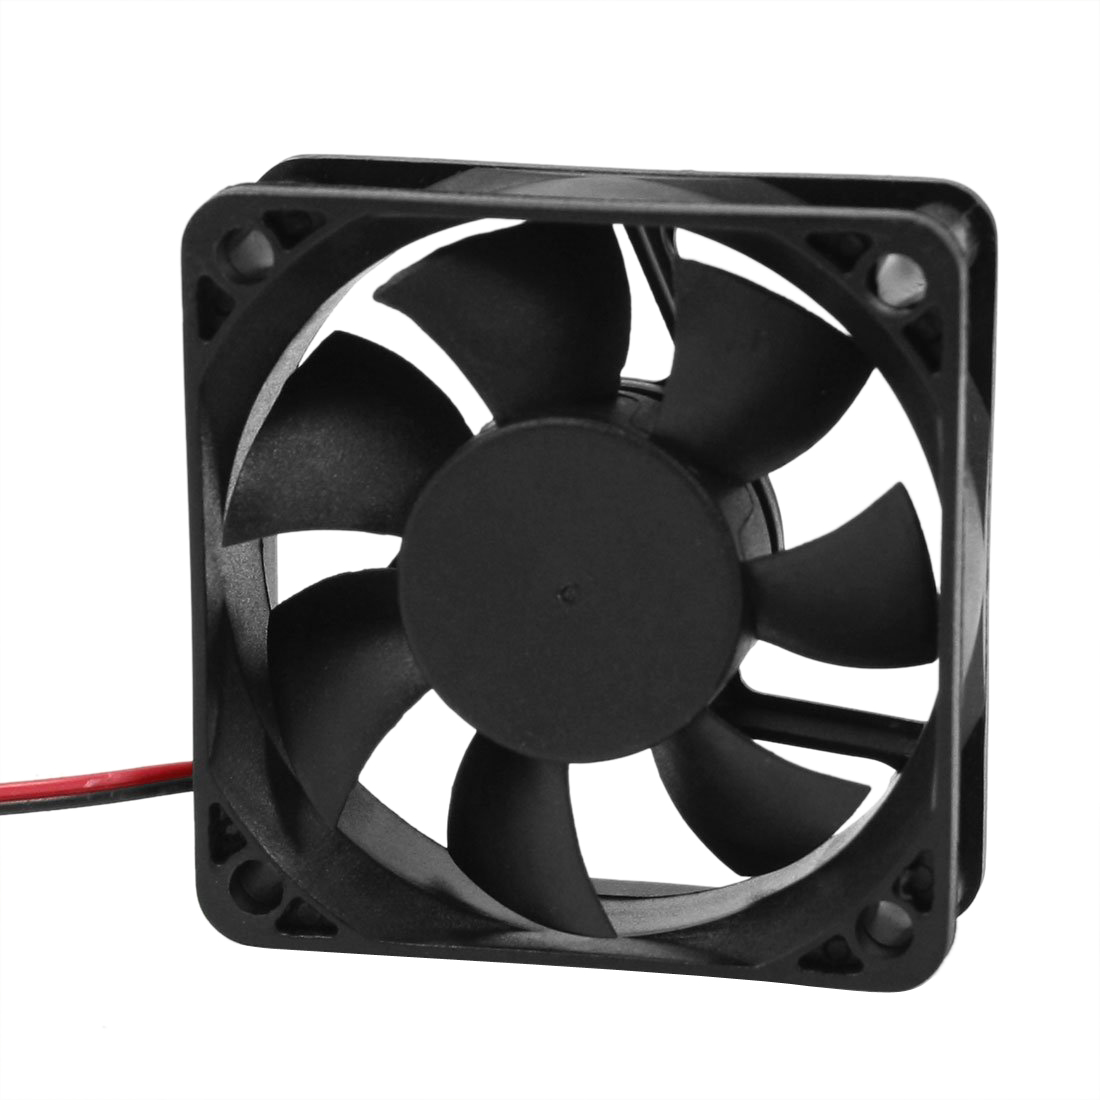 PROMOTION! Hot Sale DC 12V 2Pins Cooling Fan 60mm x 15mm for PC Computer Case CPU Cooler gdstime 2 pcs 5cm dc 12v 0 15a 50mm x 15mm high speed centrifugal blower fan 5015 computer pc case cpu cooling cooler